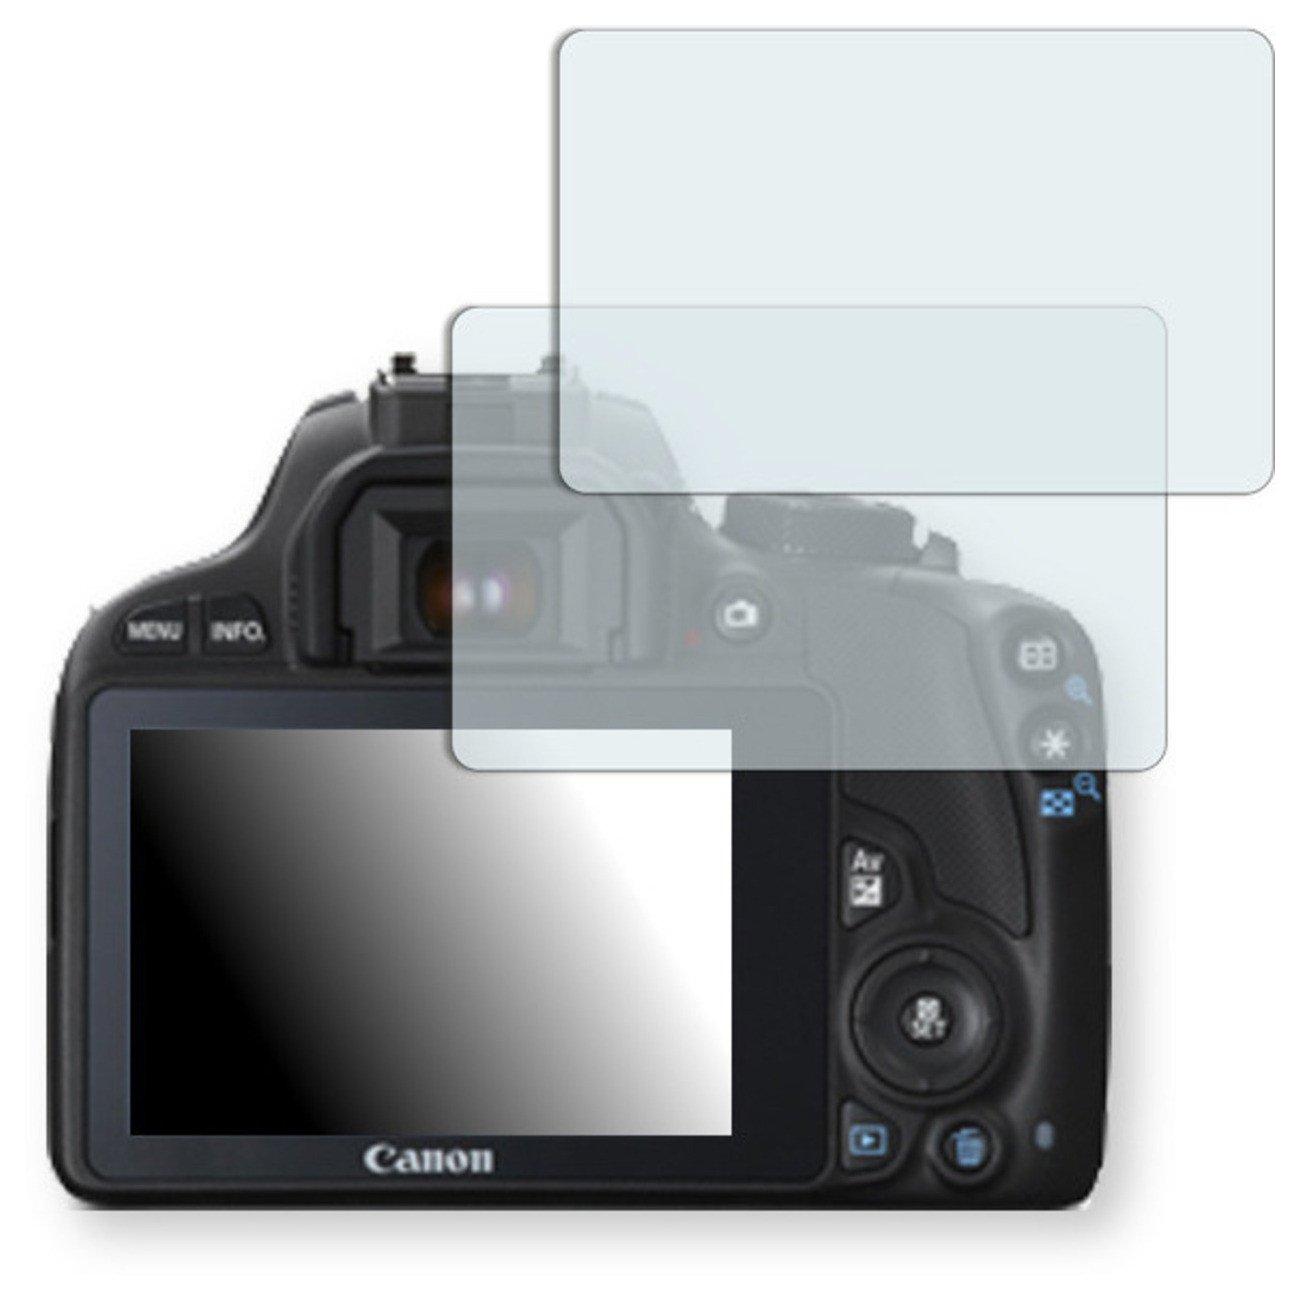 GOLEBO 2x Anti-Glare screen protector for Canon EOS SL1 (Anti-Reflex, Air pocket free application, Easy to remove)